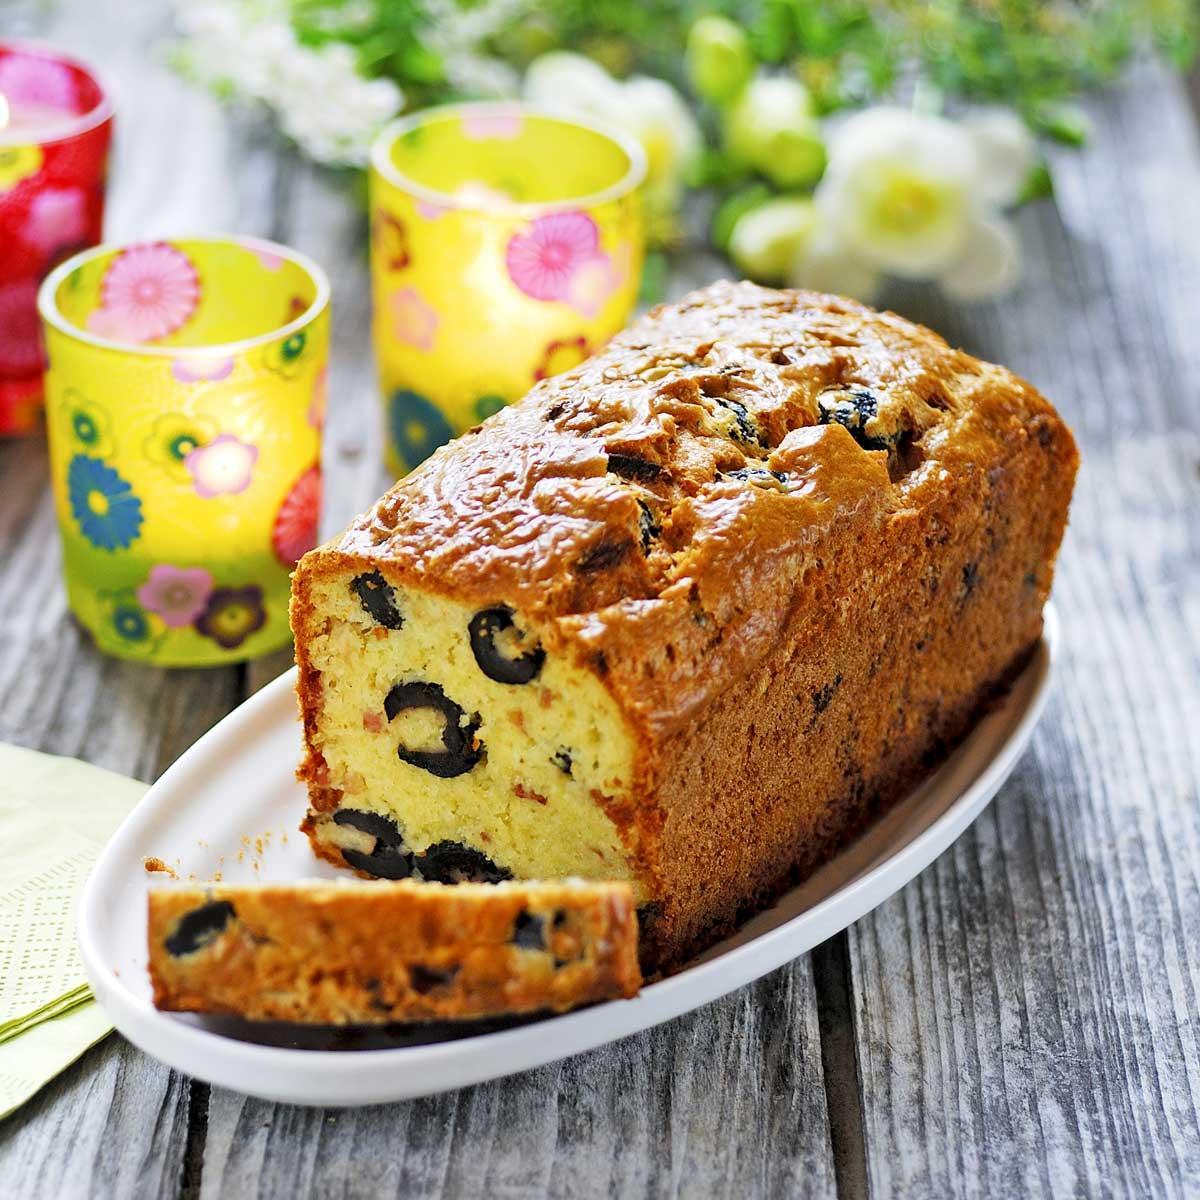 Recette cake aux olives cuisine madame figaro - Madame figaro cuisine ...